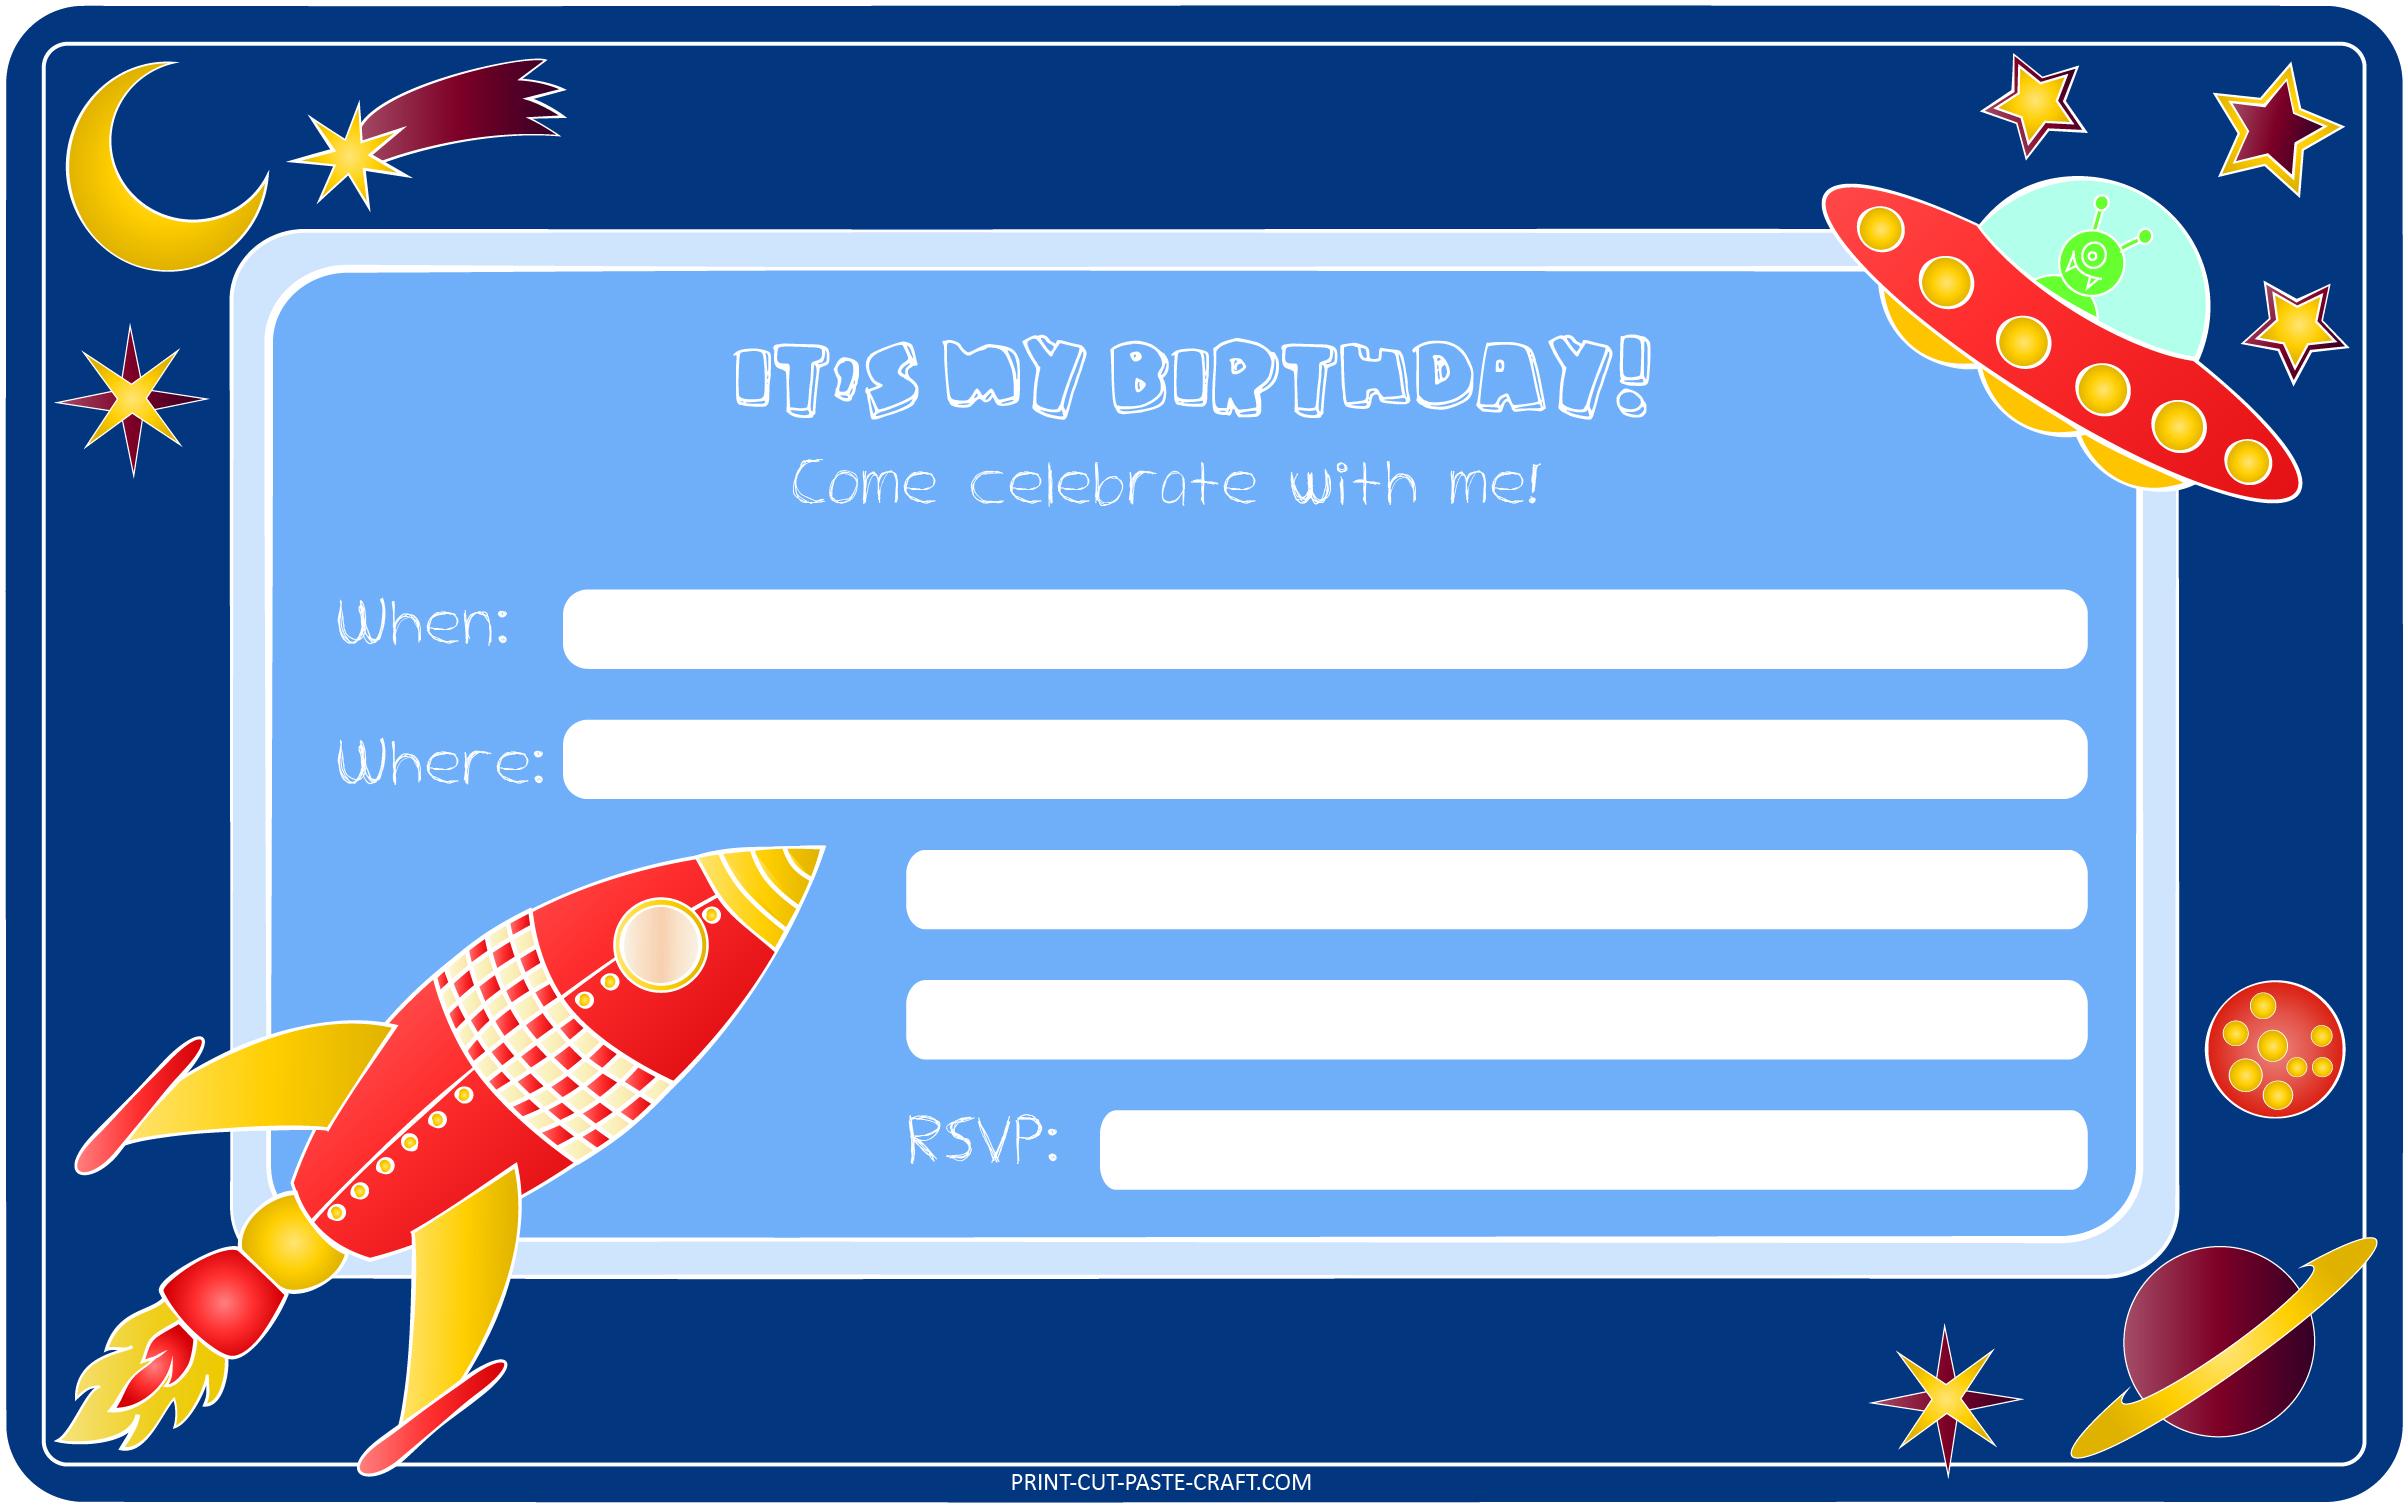 Space Birthday Invitation Download The Free Hi Resolution Jpeg Here 300dpi